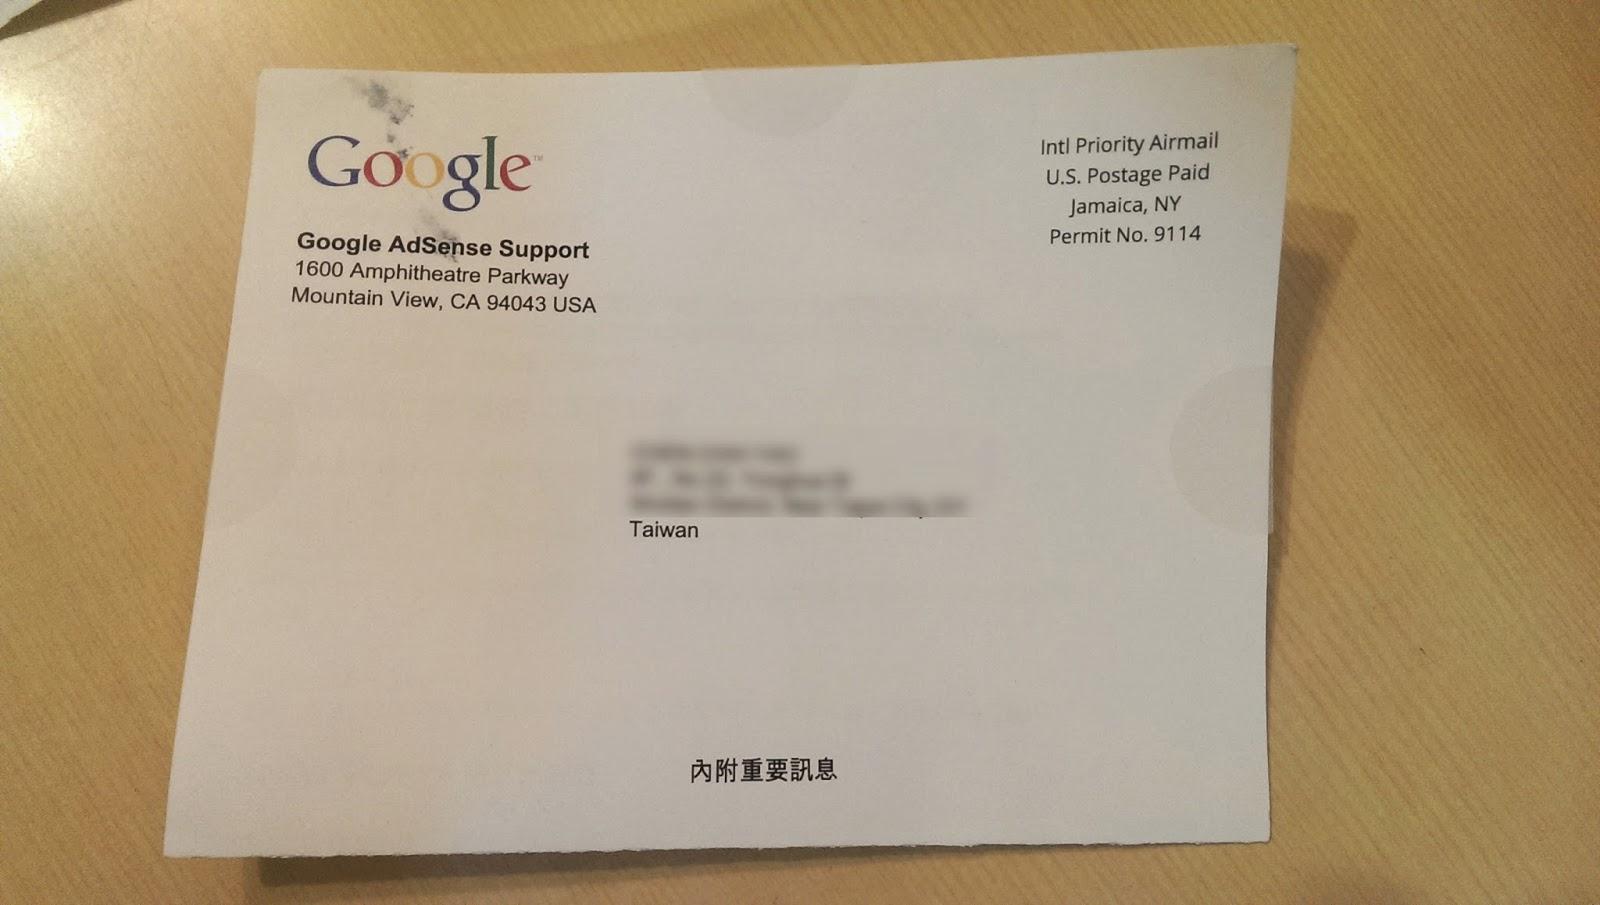 2015 01 12%2B21.51.37 - 第二封!來自Google Adsense的明信片